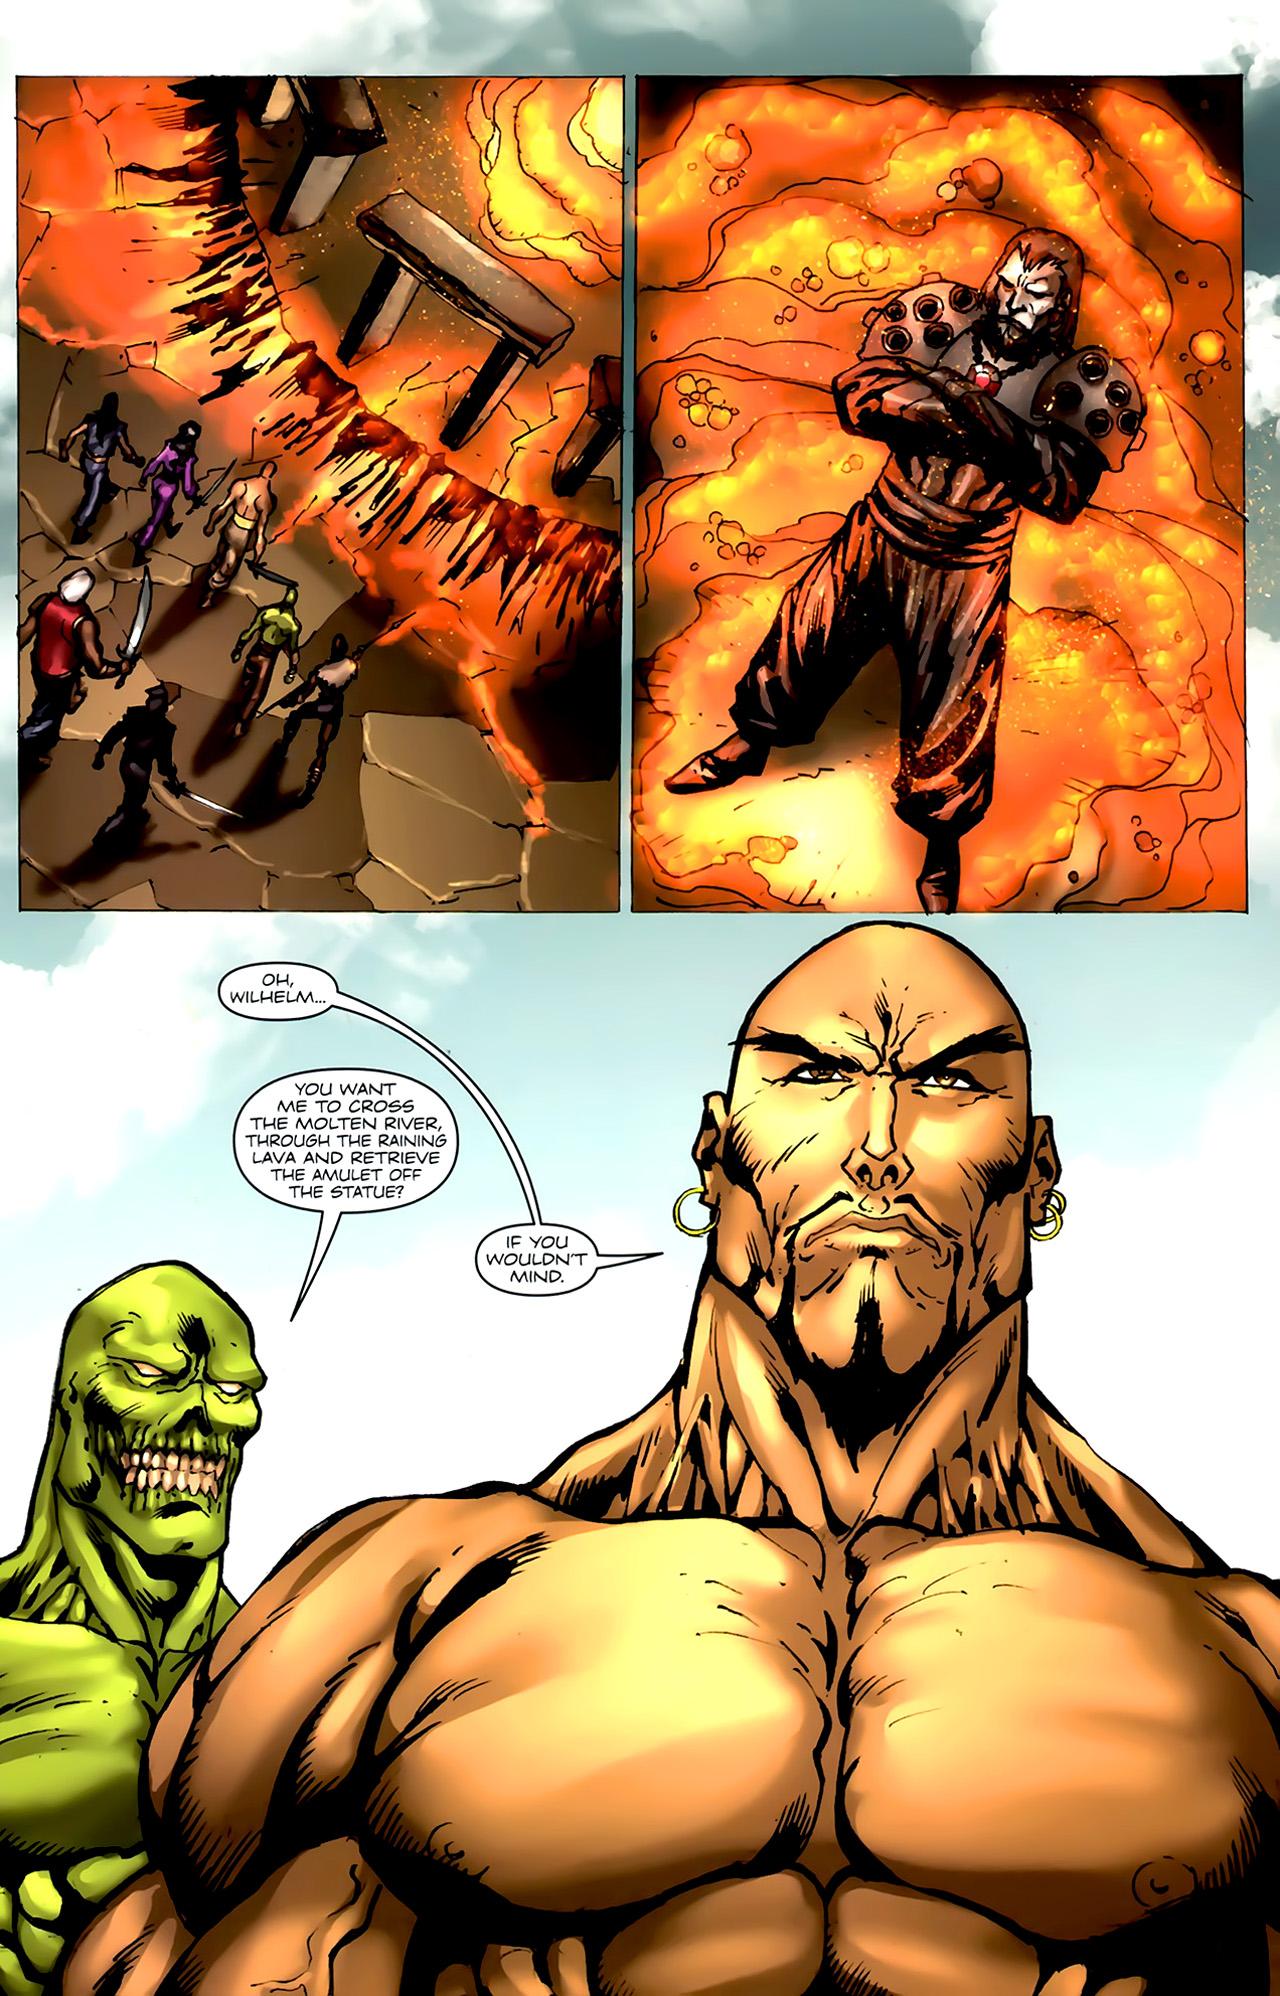 Read online 1001 Arabian Nights: The Adventures of Sinbad comic -  Issue #4 - 24